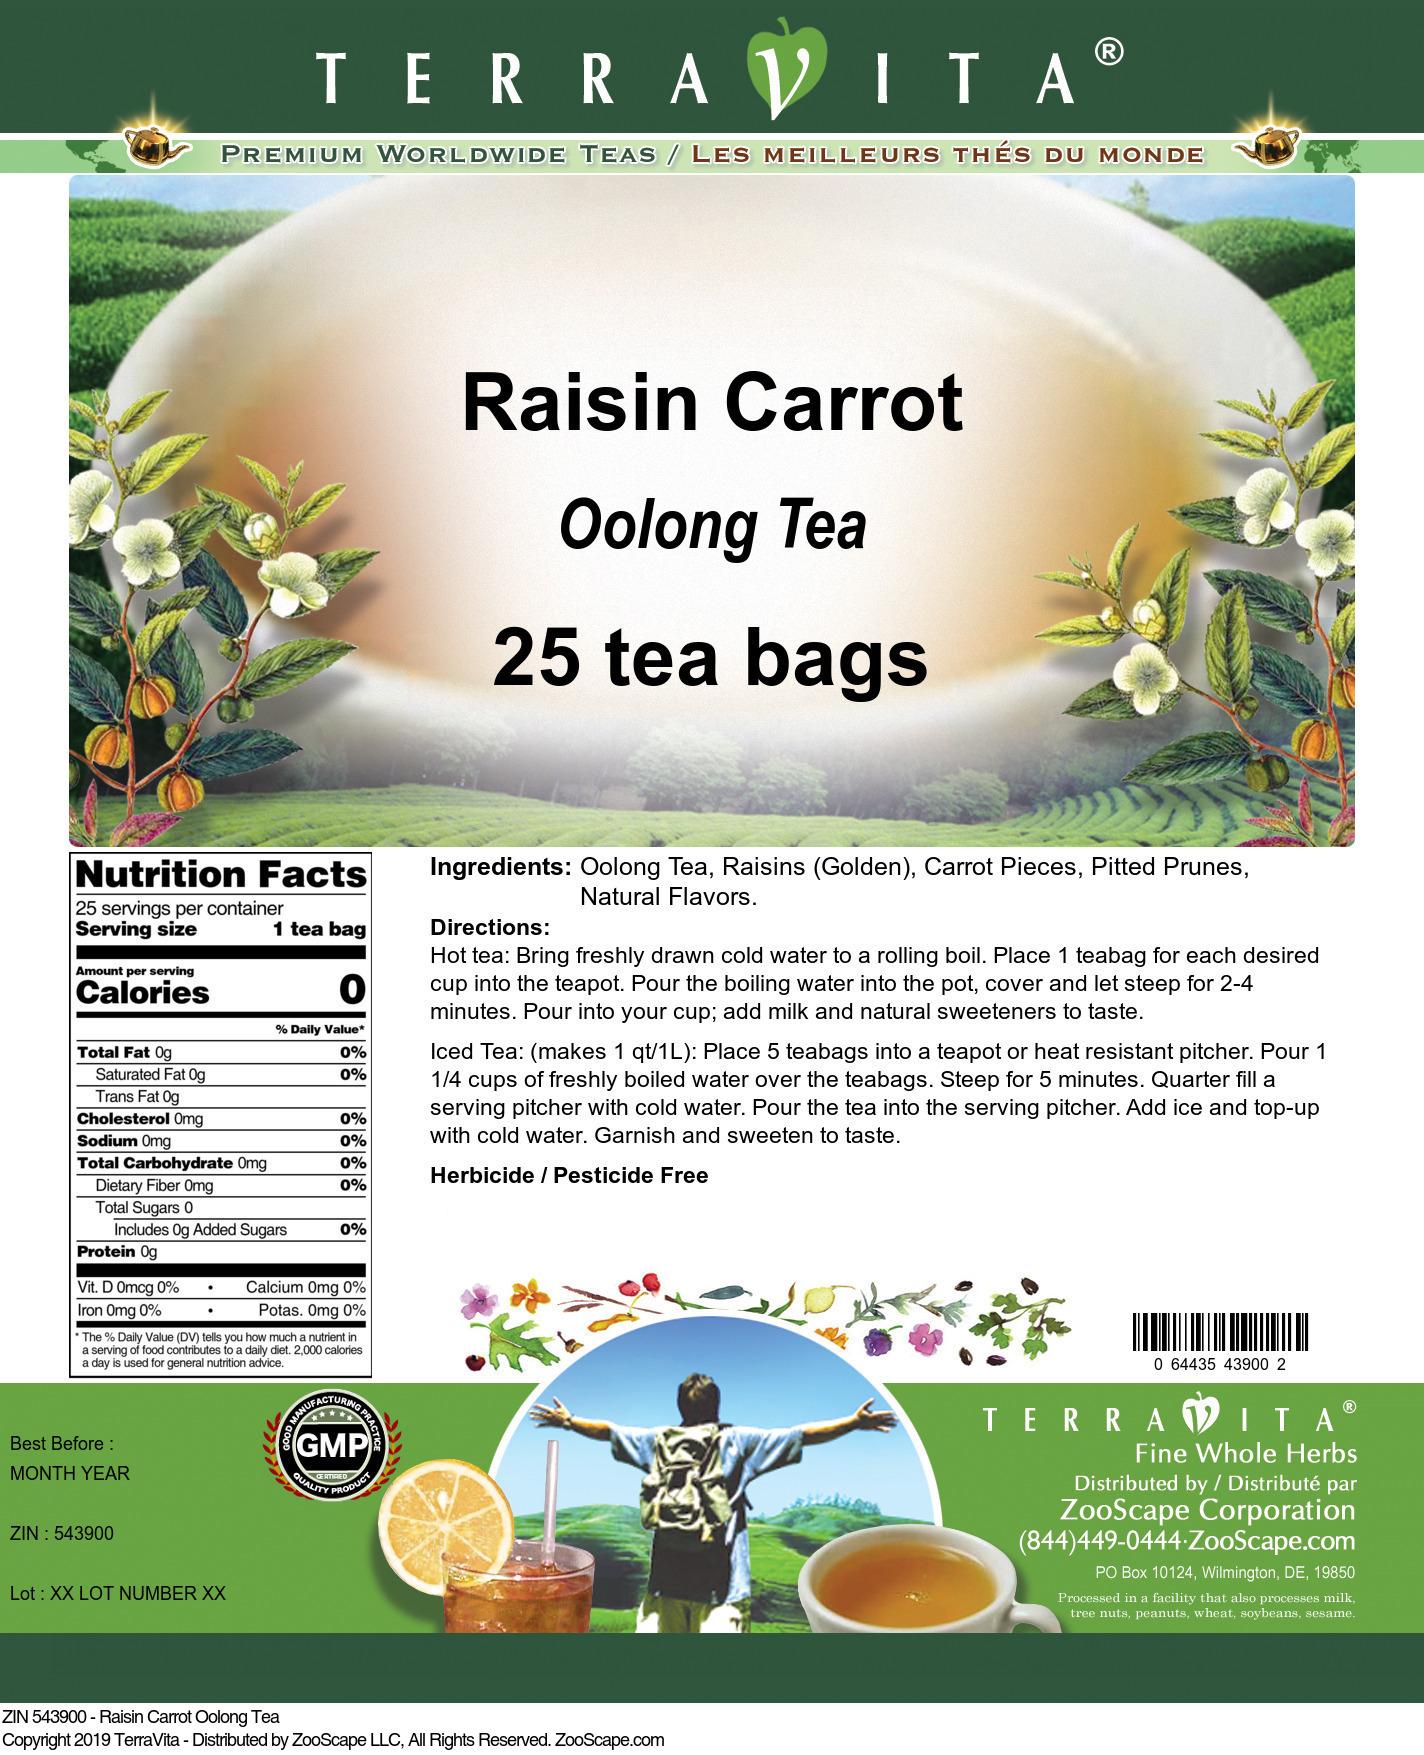 Raisin Carrot Oolong Tea